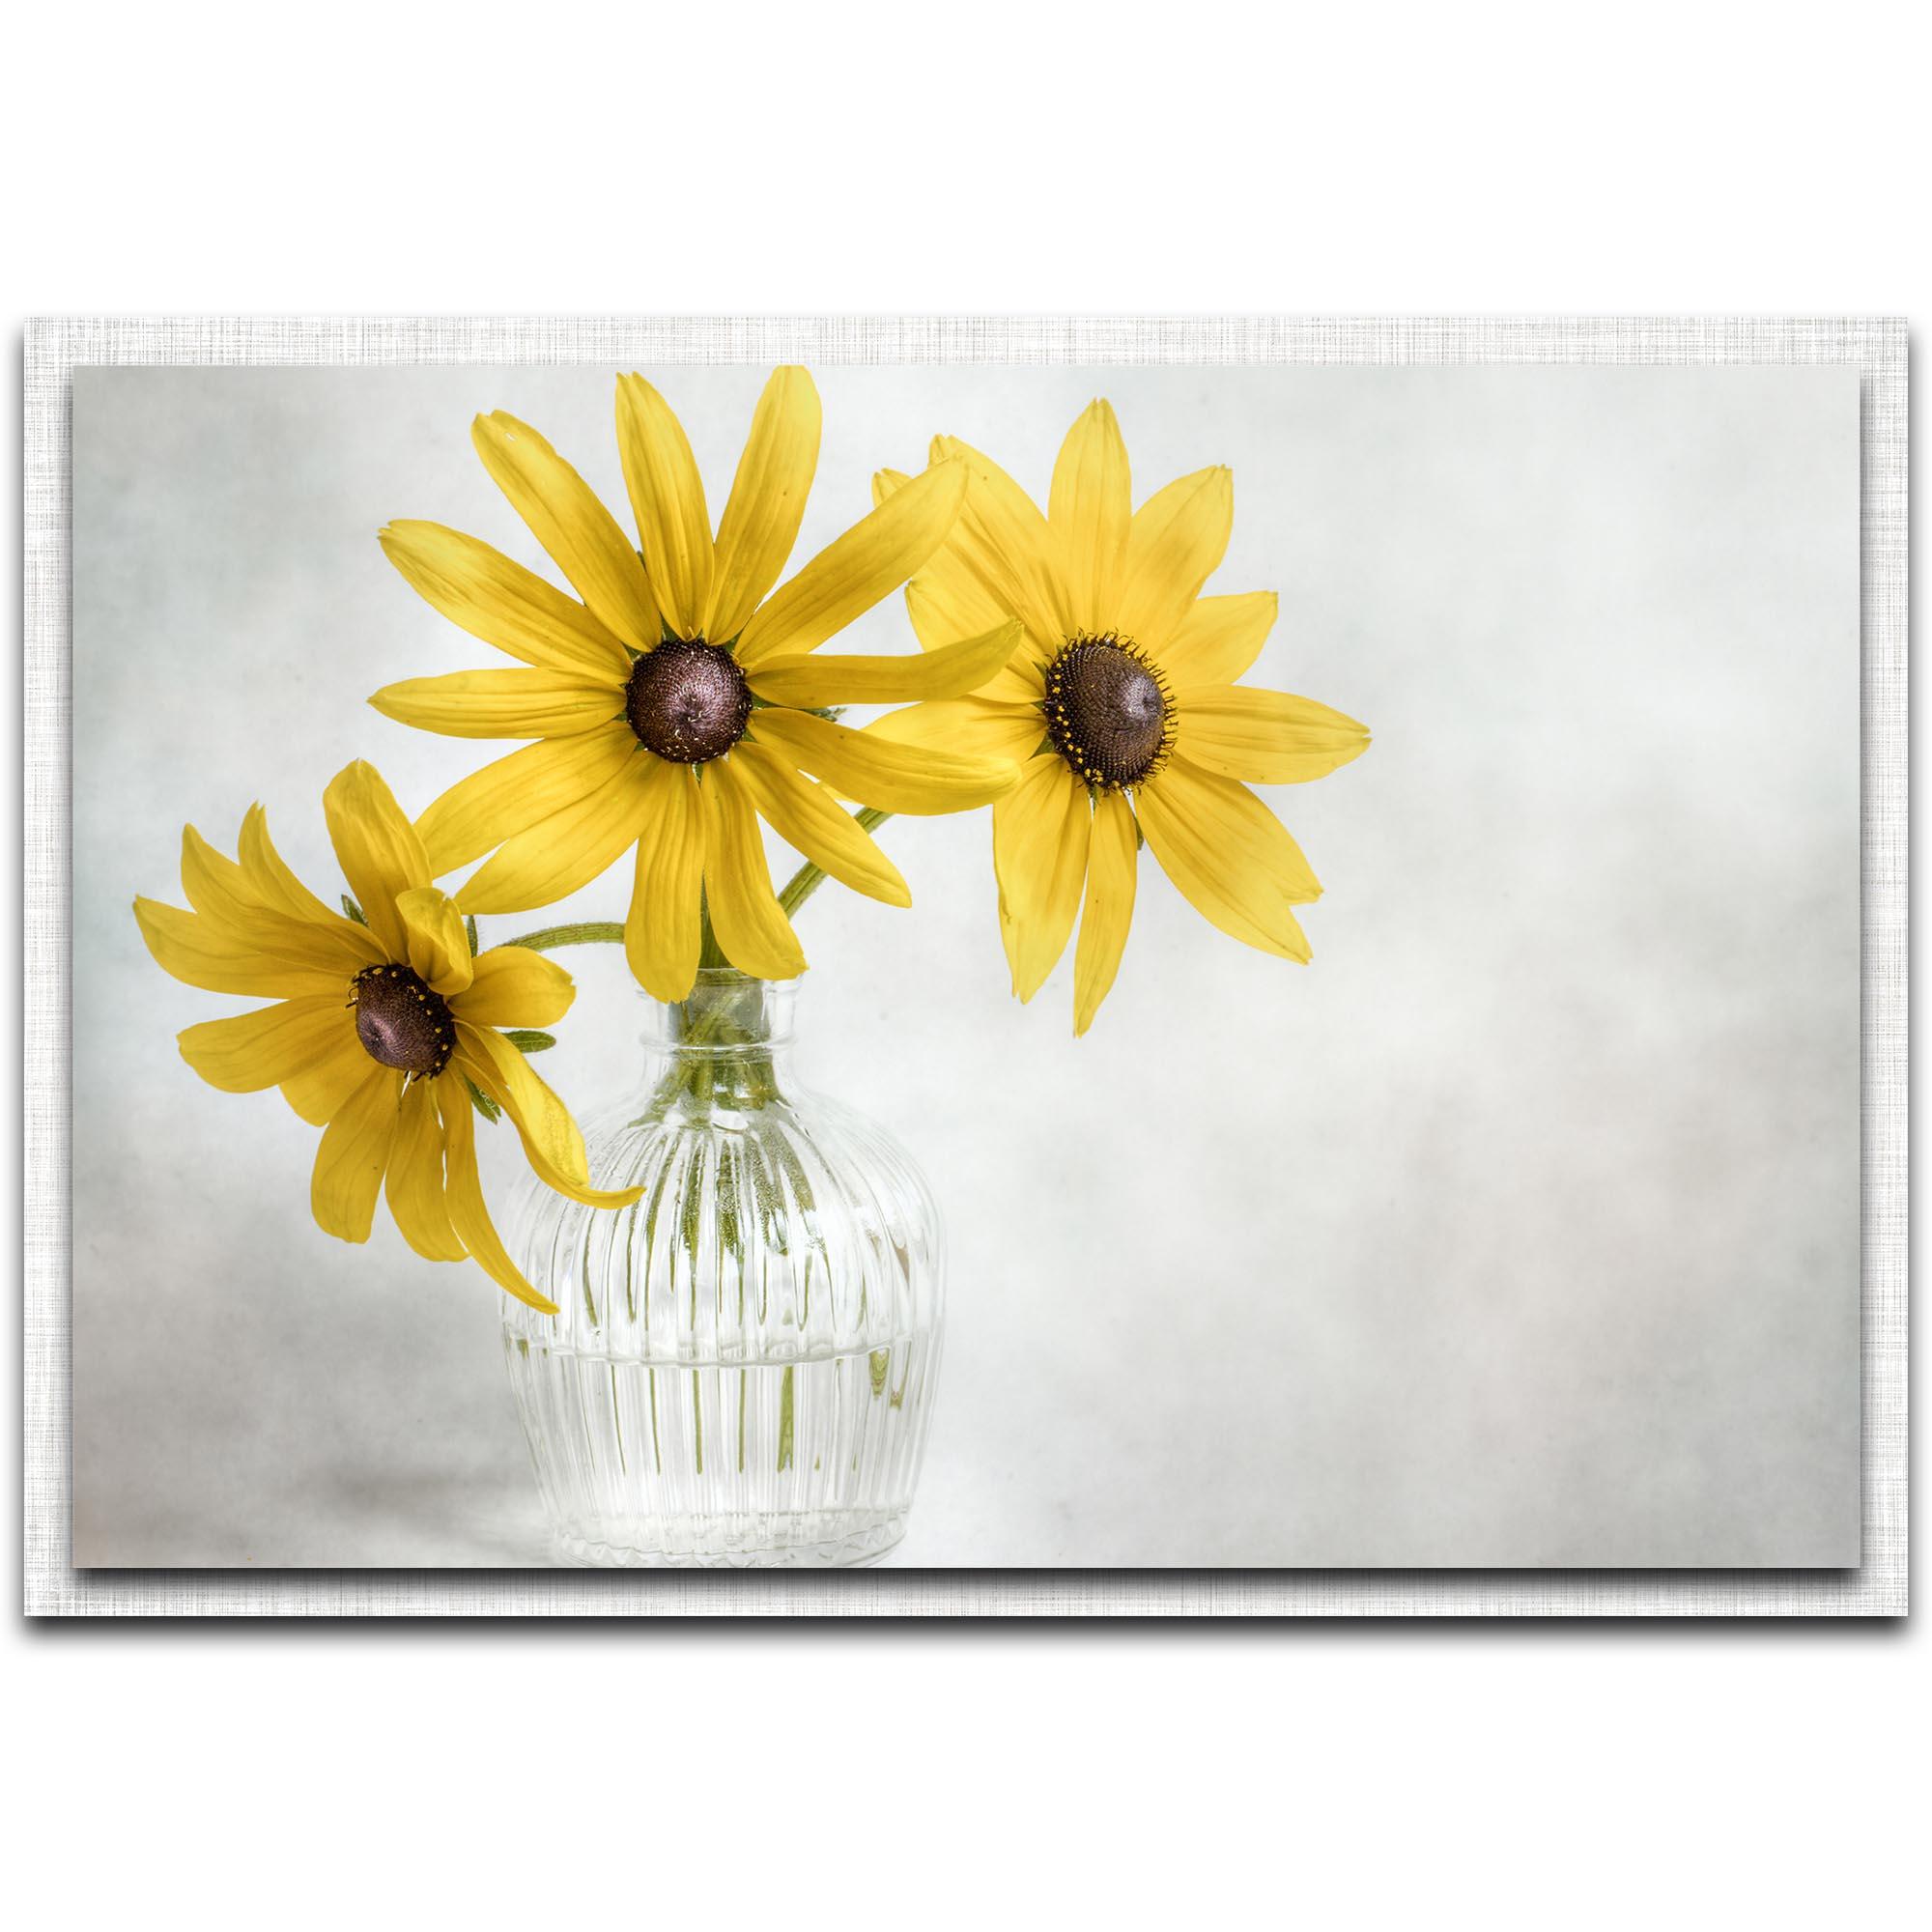 Mandy Disher 'Rudbeckia' 32in x 22in Modern Farmhouse Floral on Metal